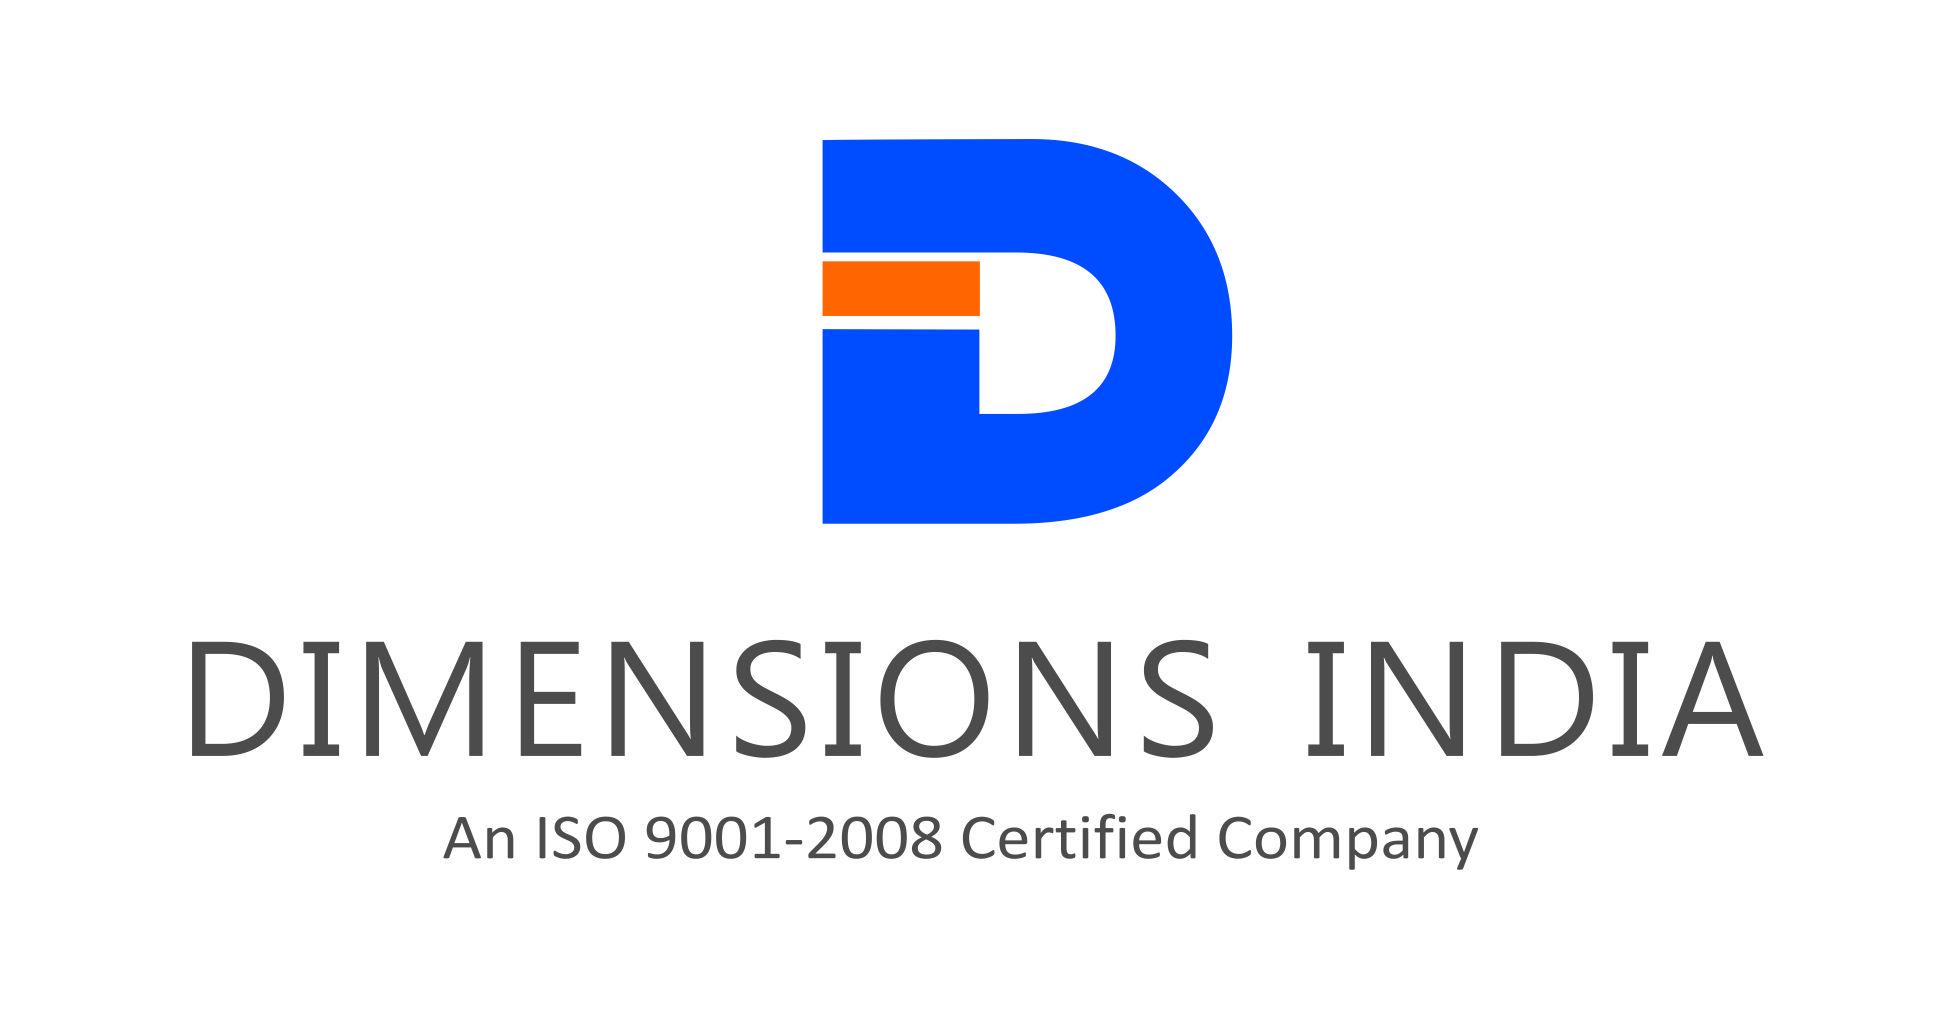 LED SIGN BOARD +918860908890 - logo